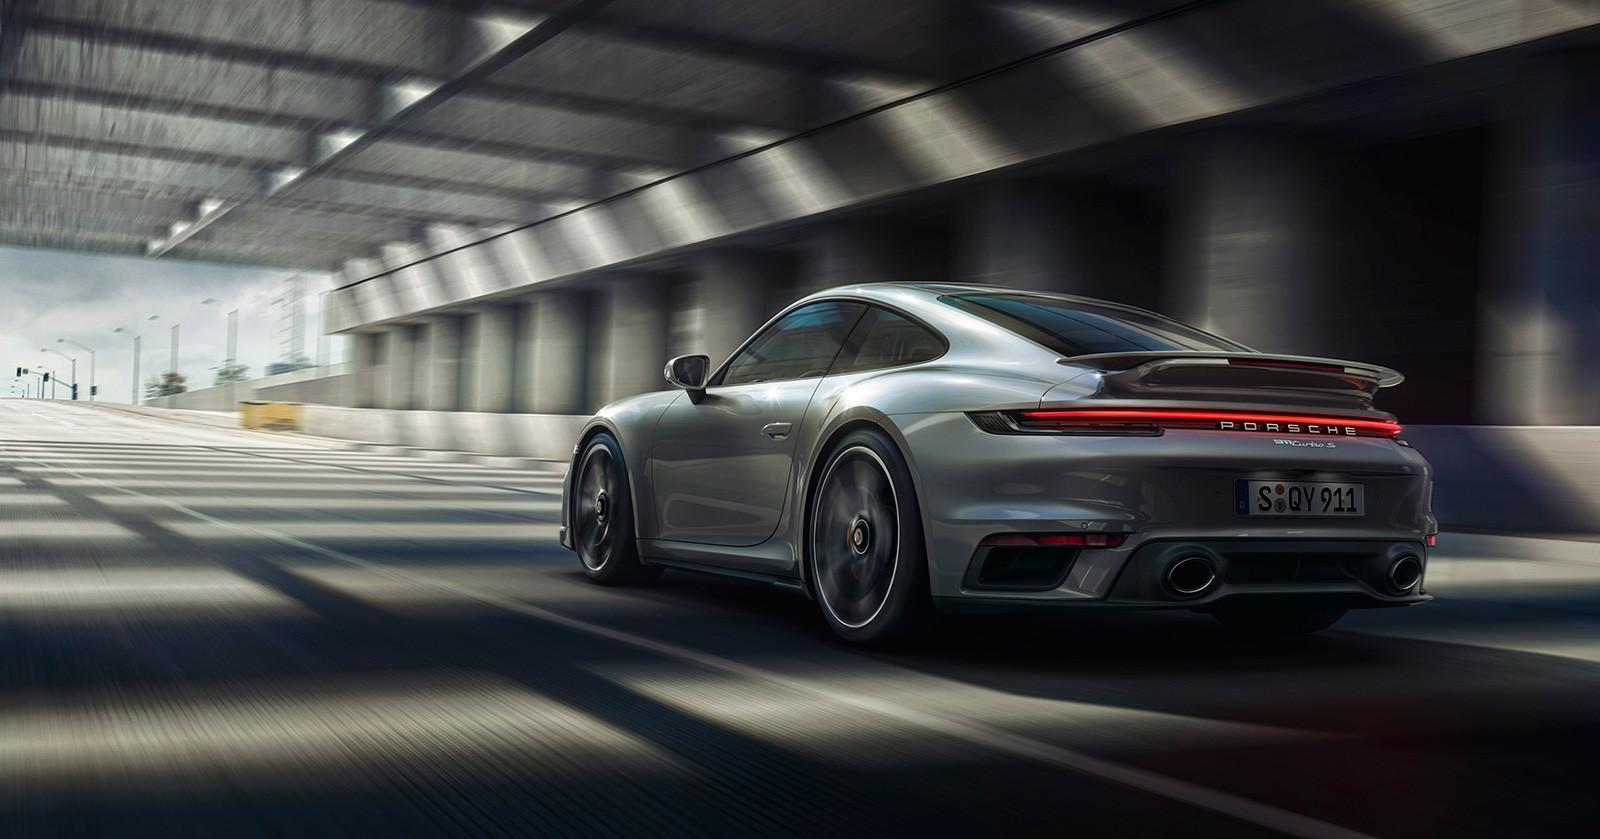 Foto de Porsche 911 Turbo S 2020 (1/18)